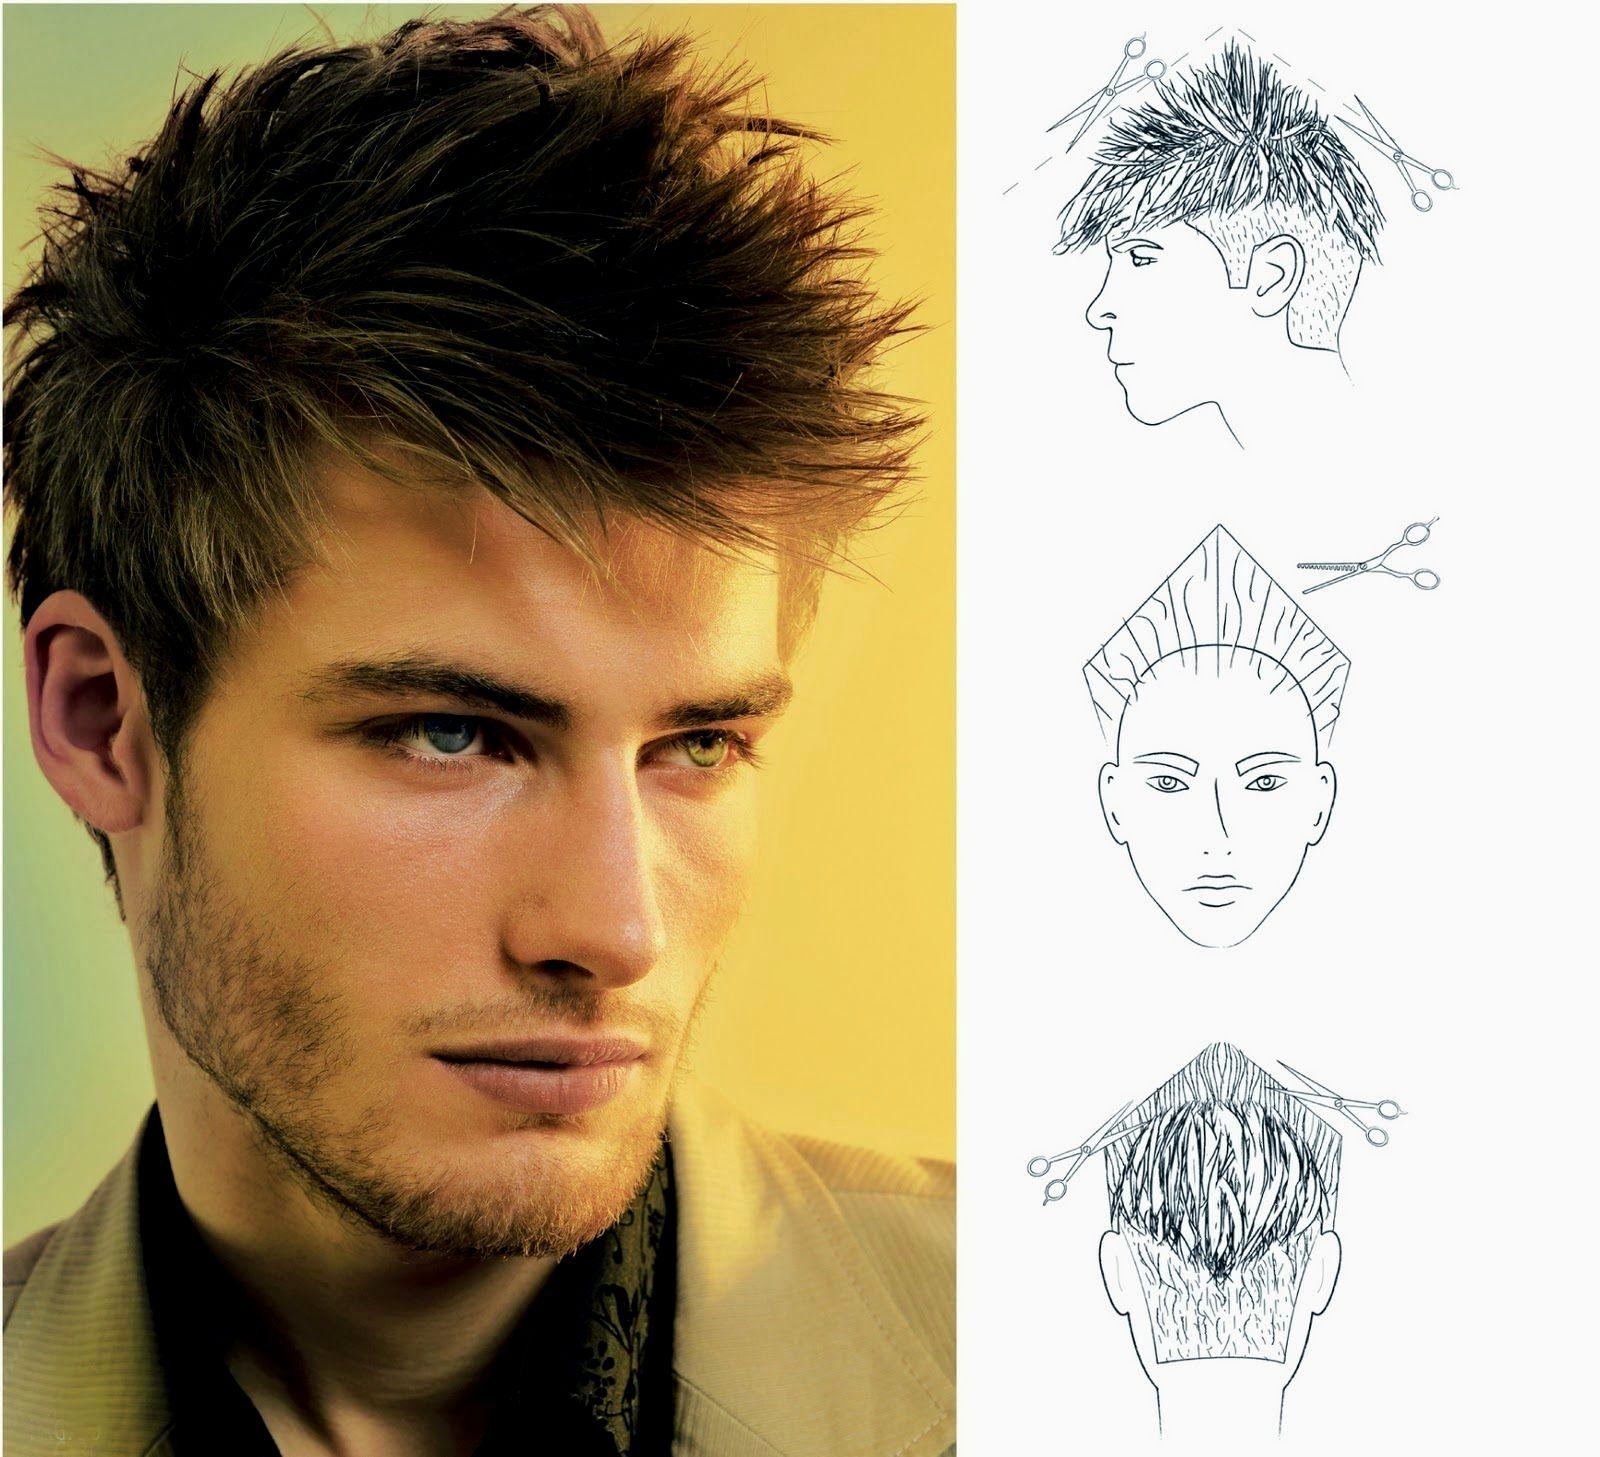 Ótimo modelo corte cabelo masculino inspiração-Fresh Modelo Corte Cabelo Masculino Imagem